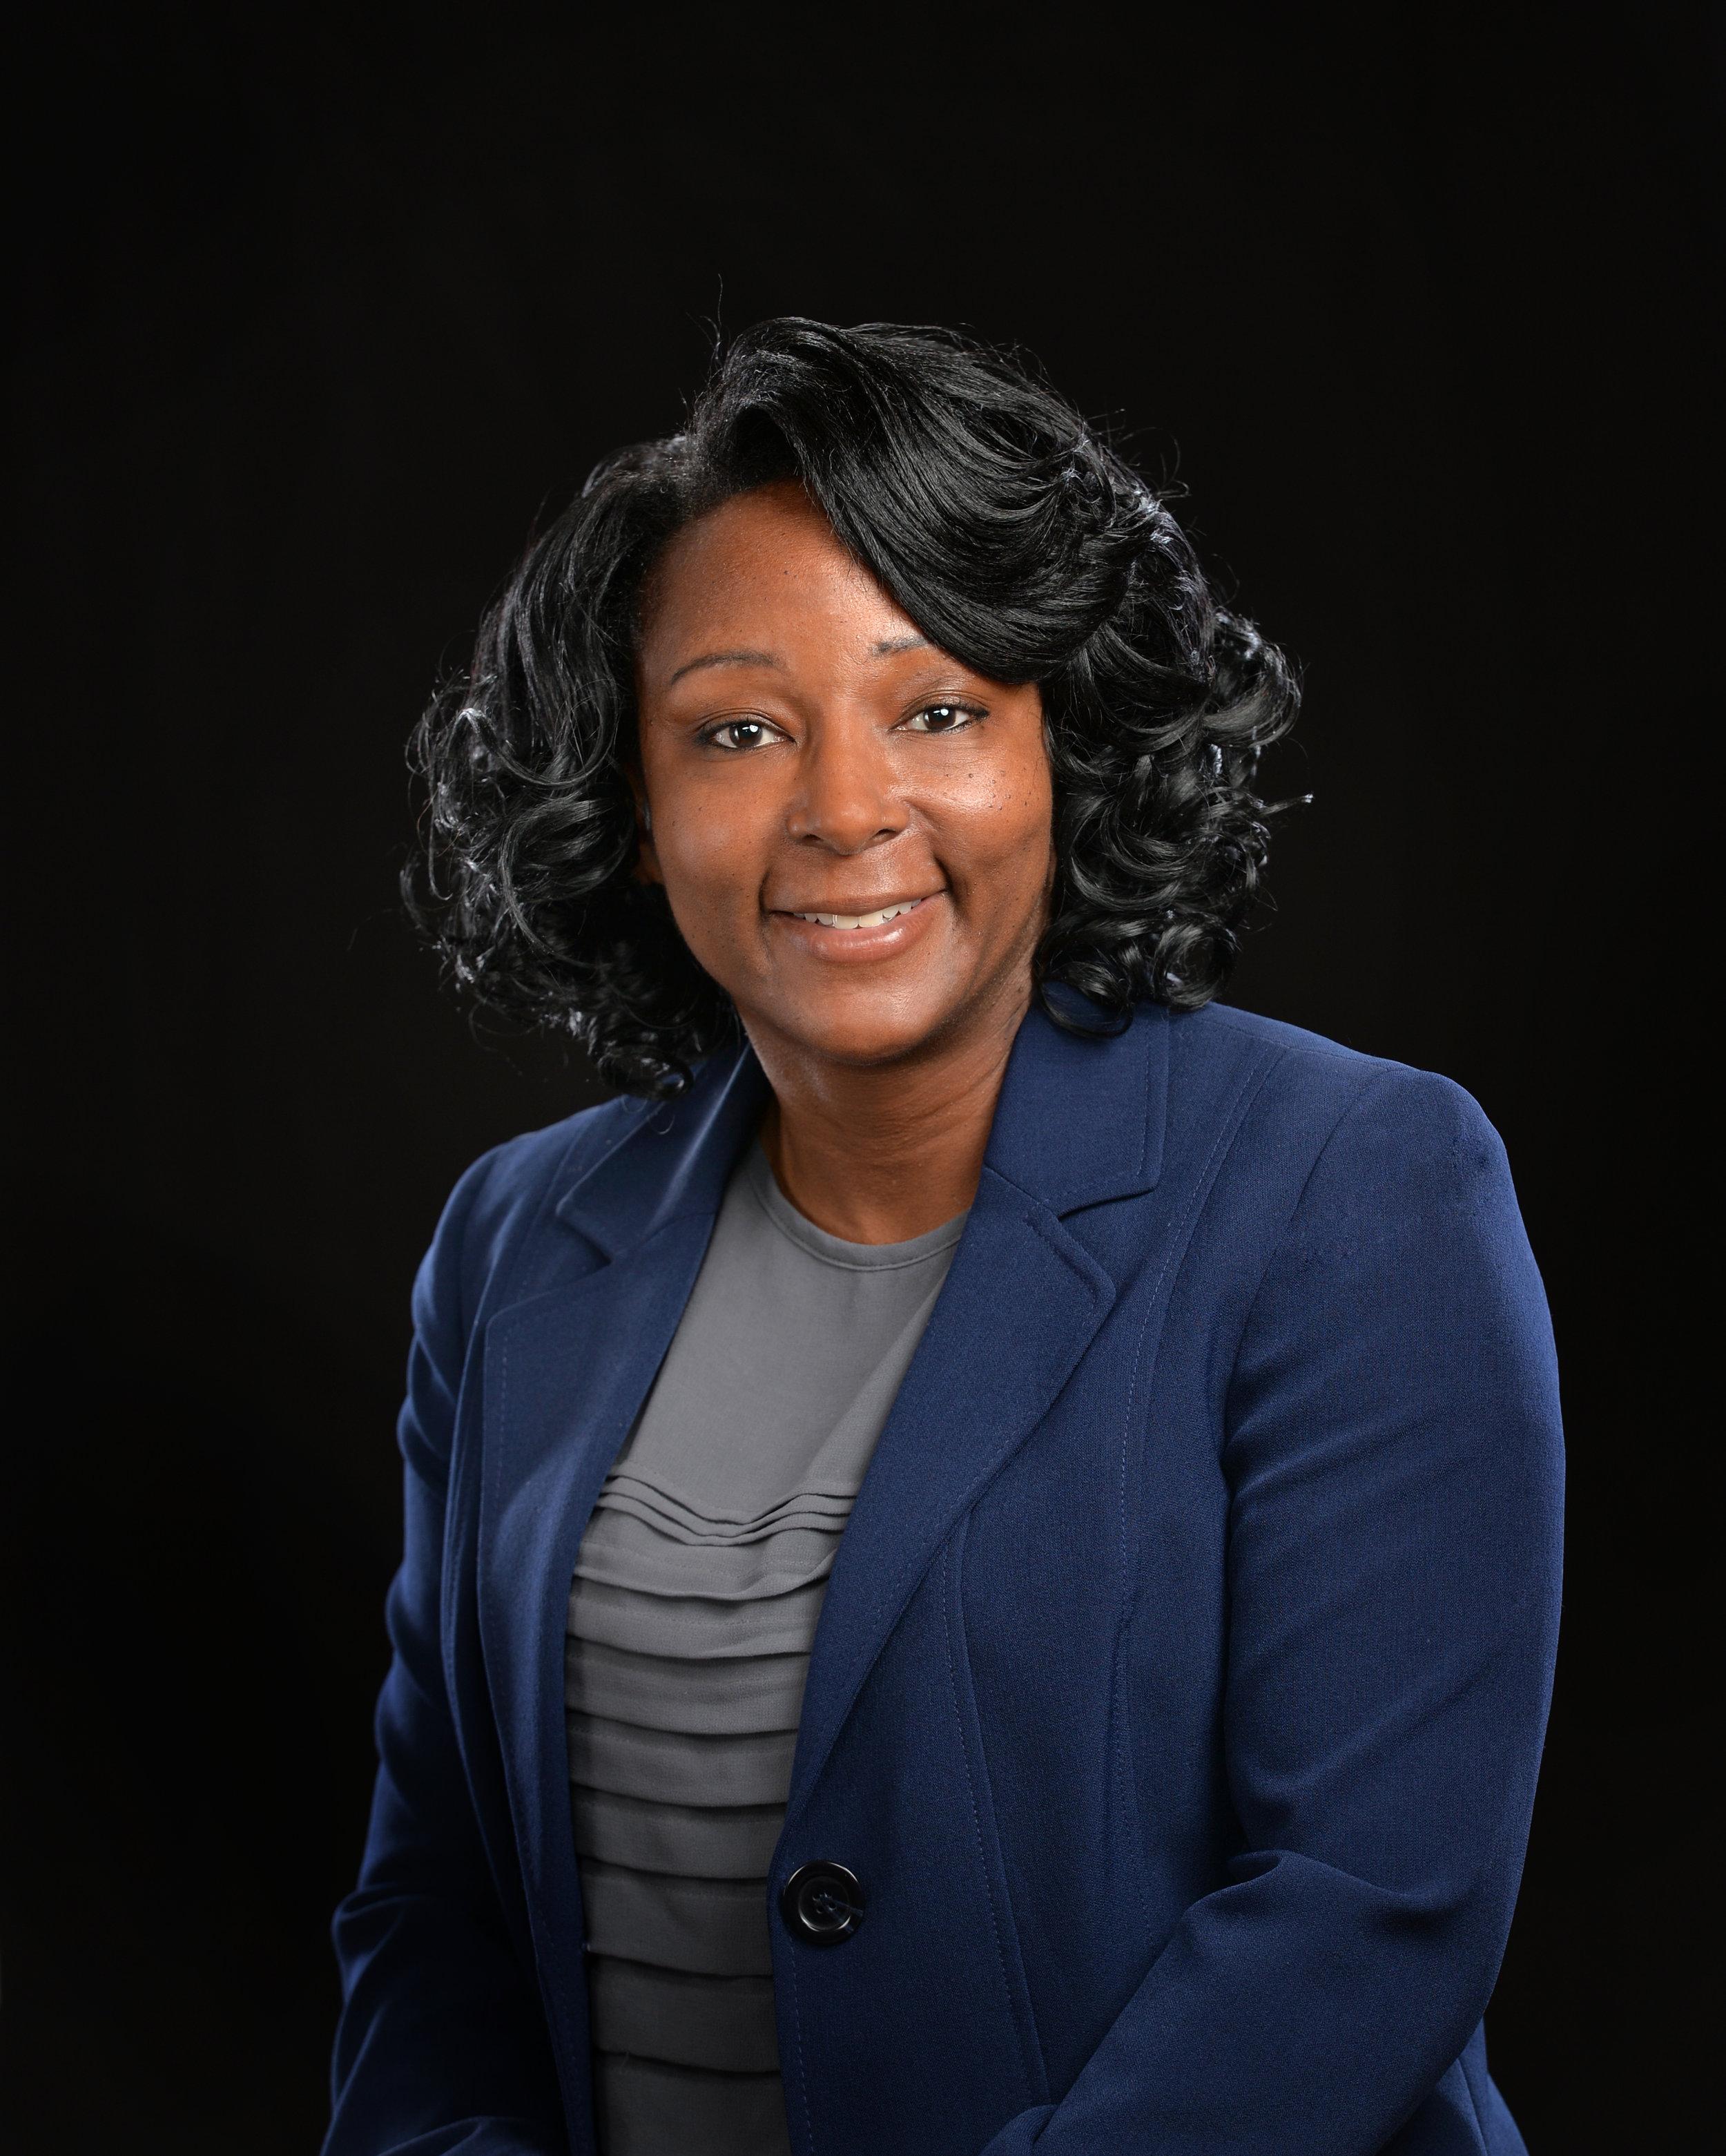 Kimberly Nelson, Board Member